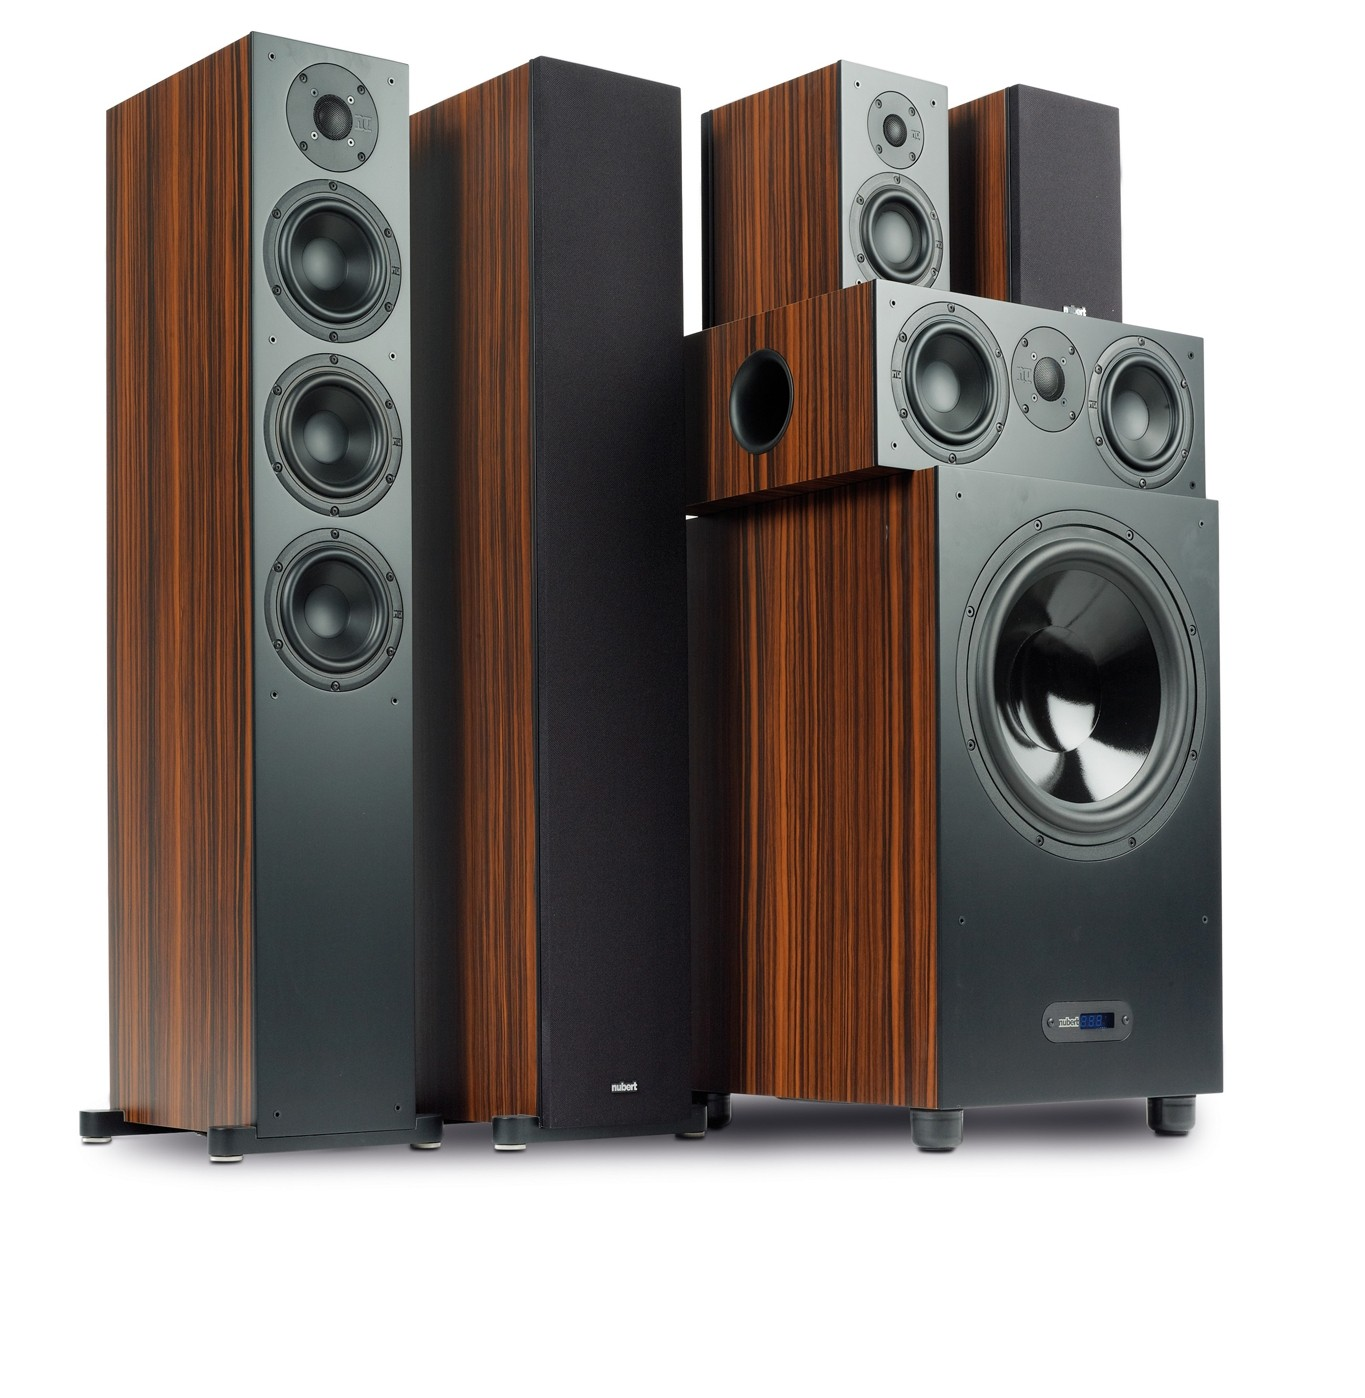 test lautsprecher surround nubert 5 1 nubox set 513. Black Bedroom Furniture Sets. Home Design Ideas